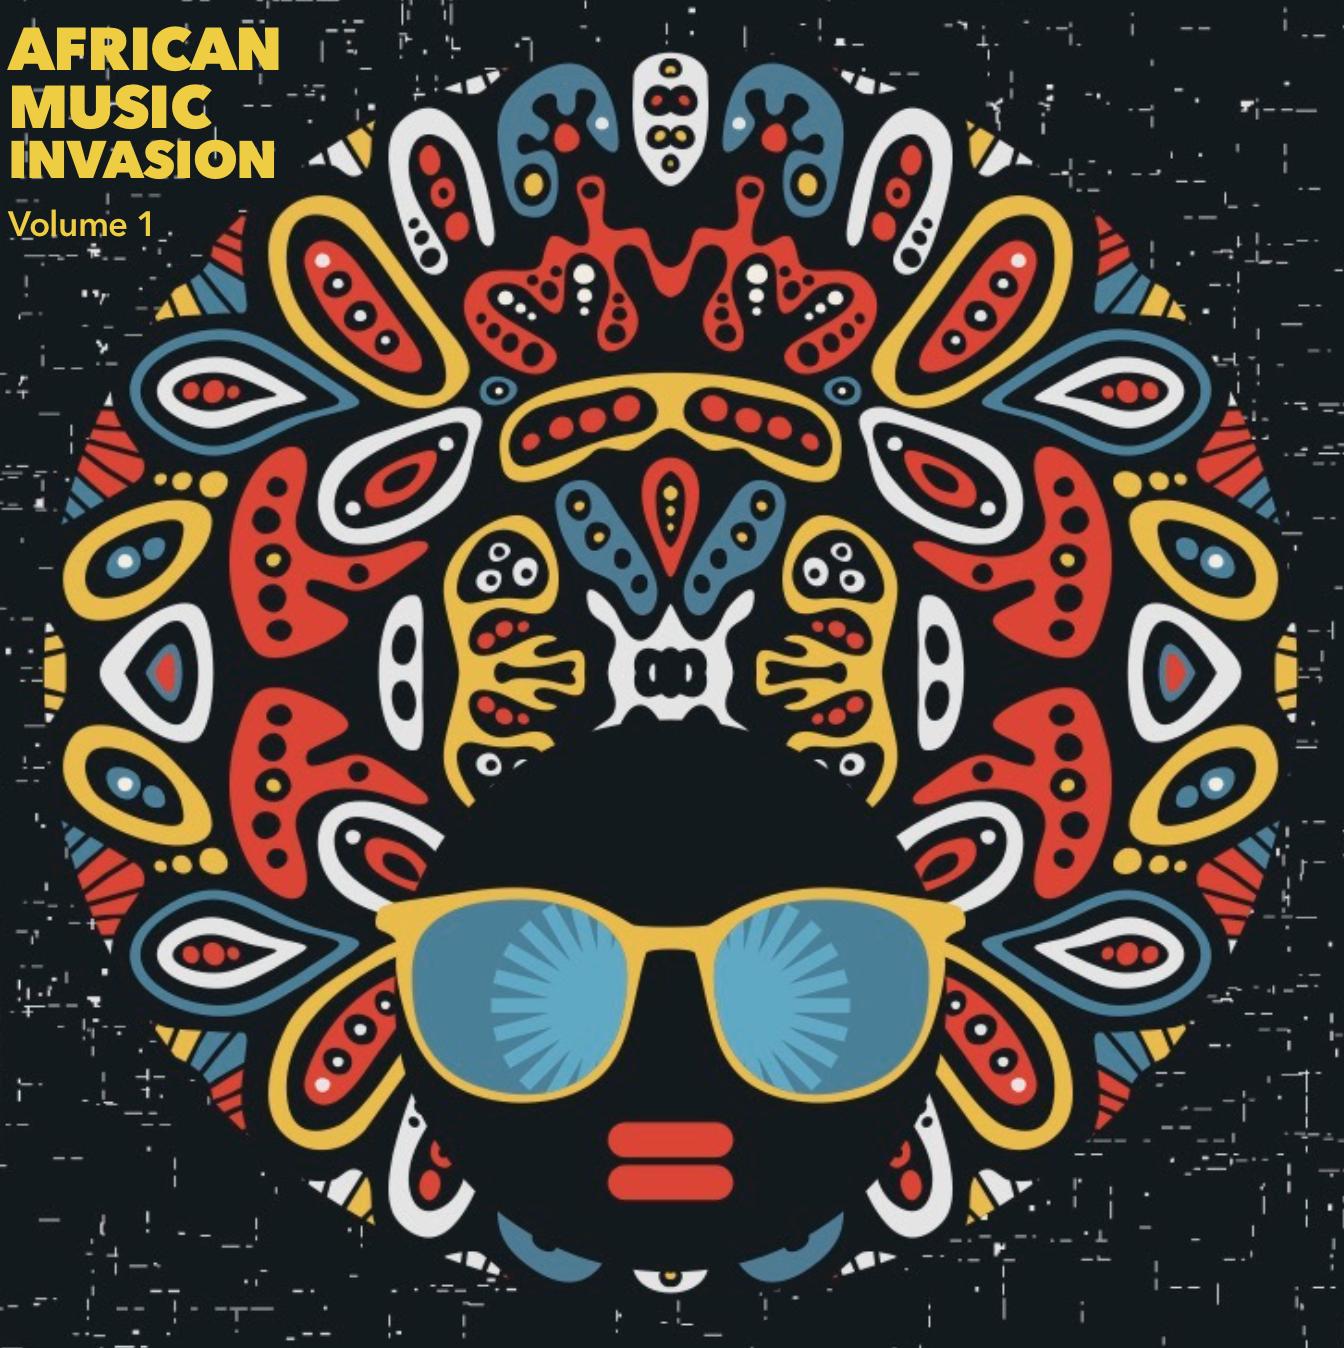 African Music Invasion